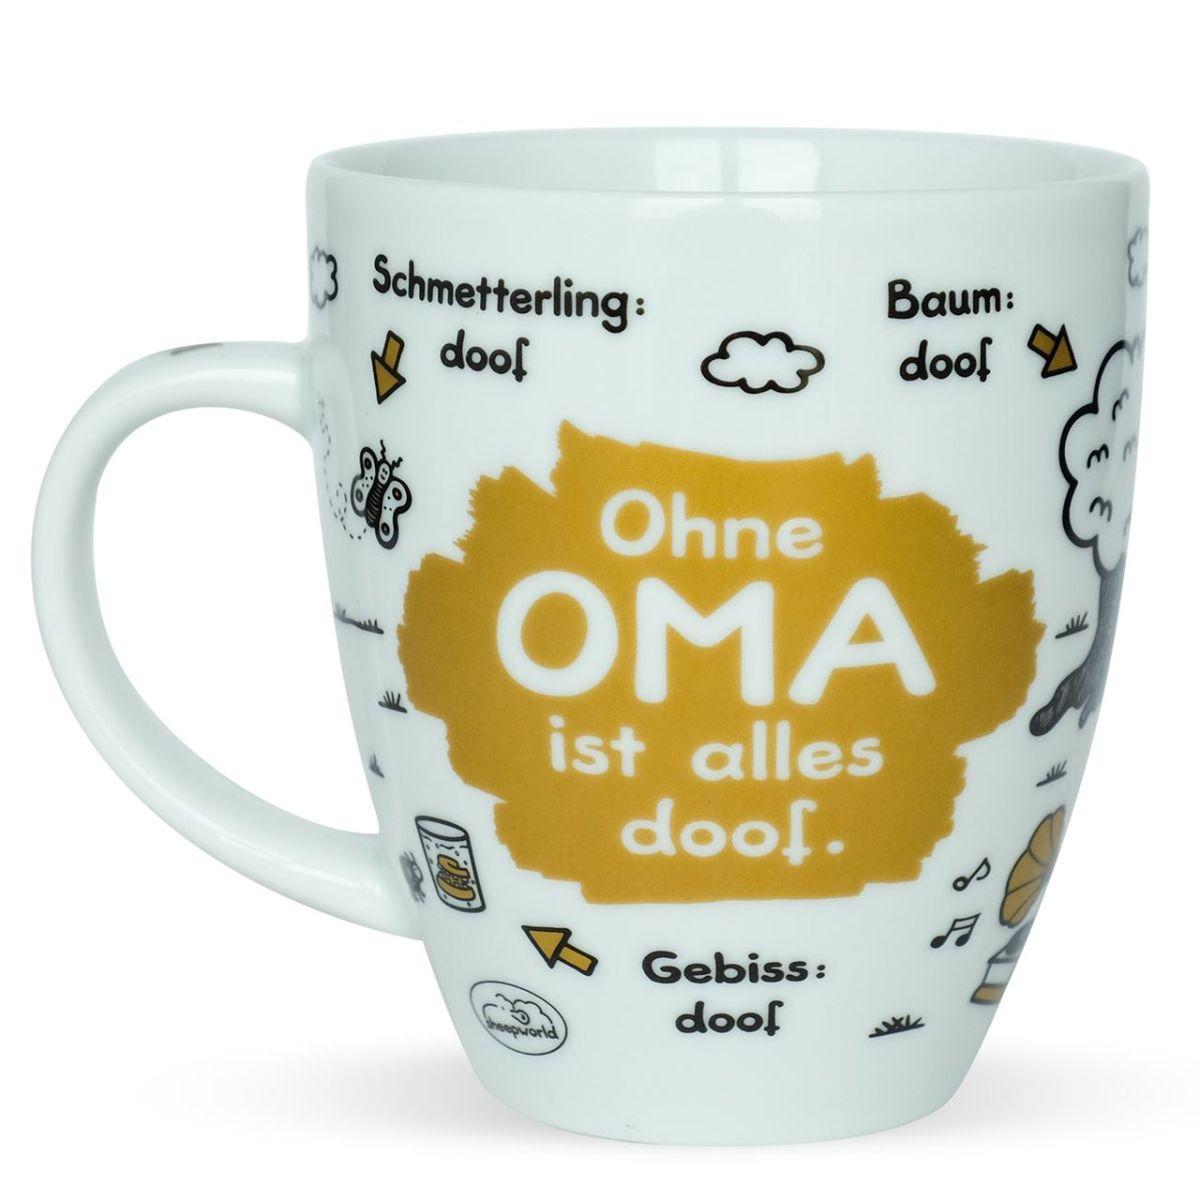 sheepworld tasse ohne oma ist alles doof 400 ml kaffeetasse kaffeebecher mug ebay. Black Bedroom Furniture Sets. Home Design Ideas